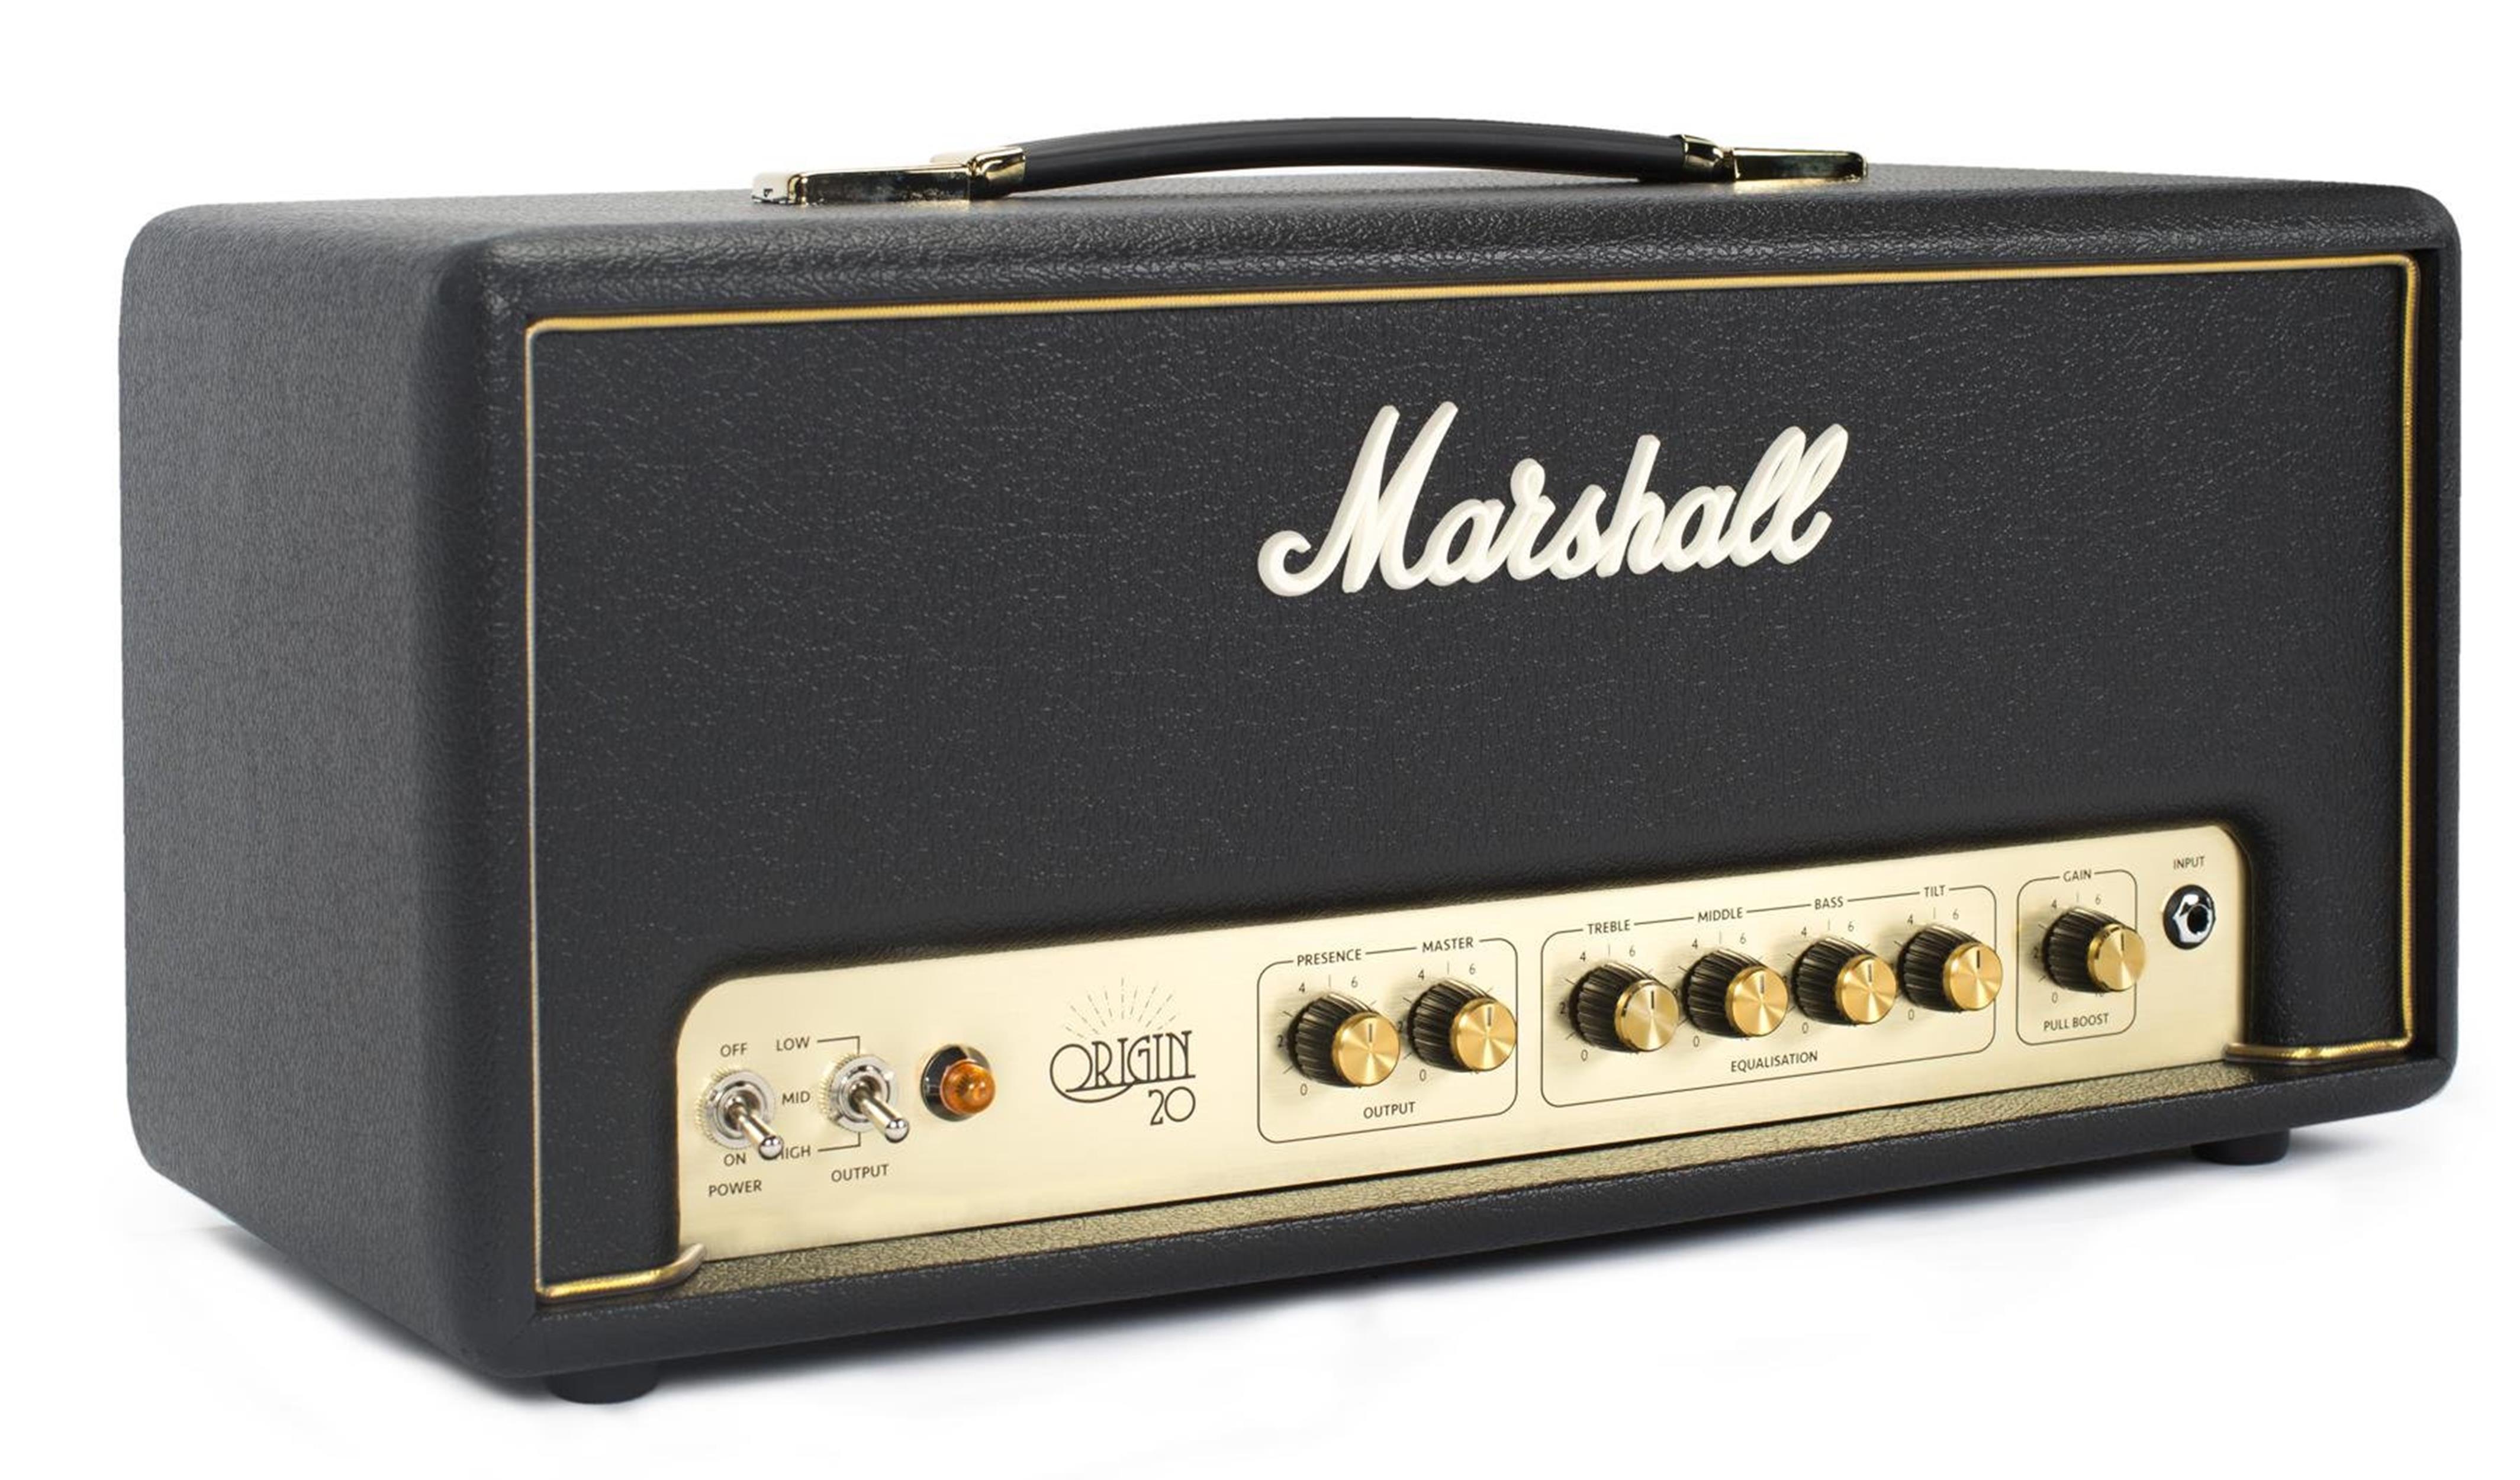 MARSHALL ORIGIN 20 HEAD - Chitarre Amplificatori - Testate